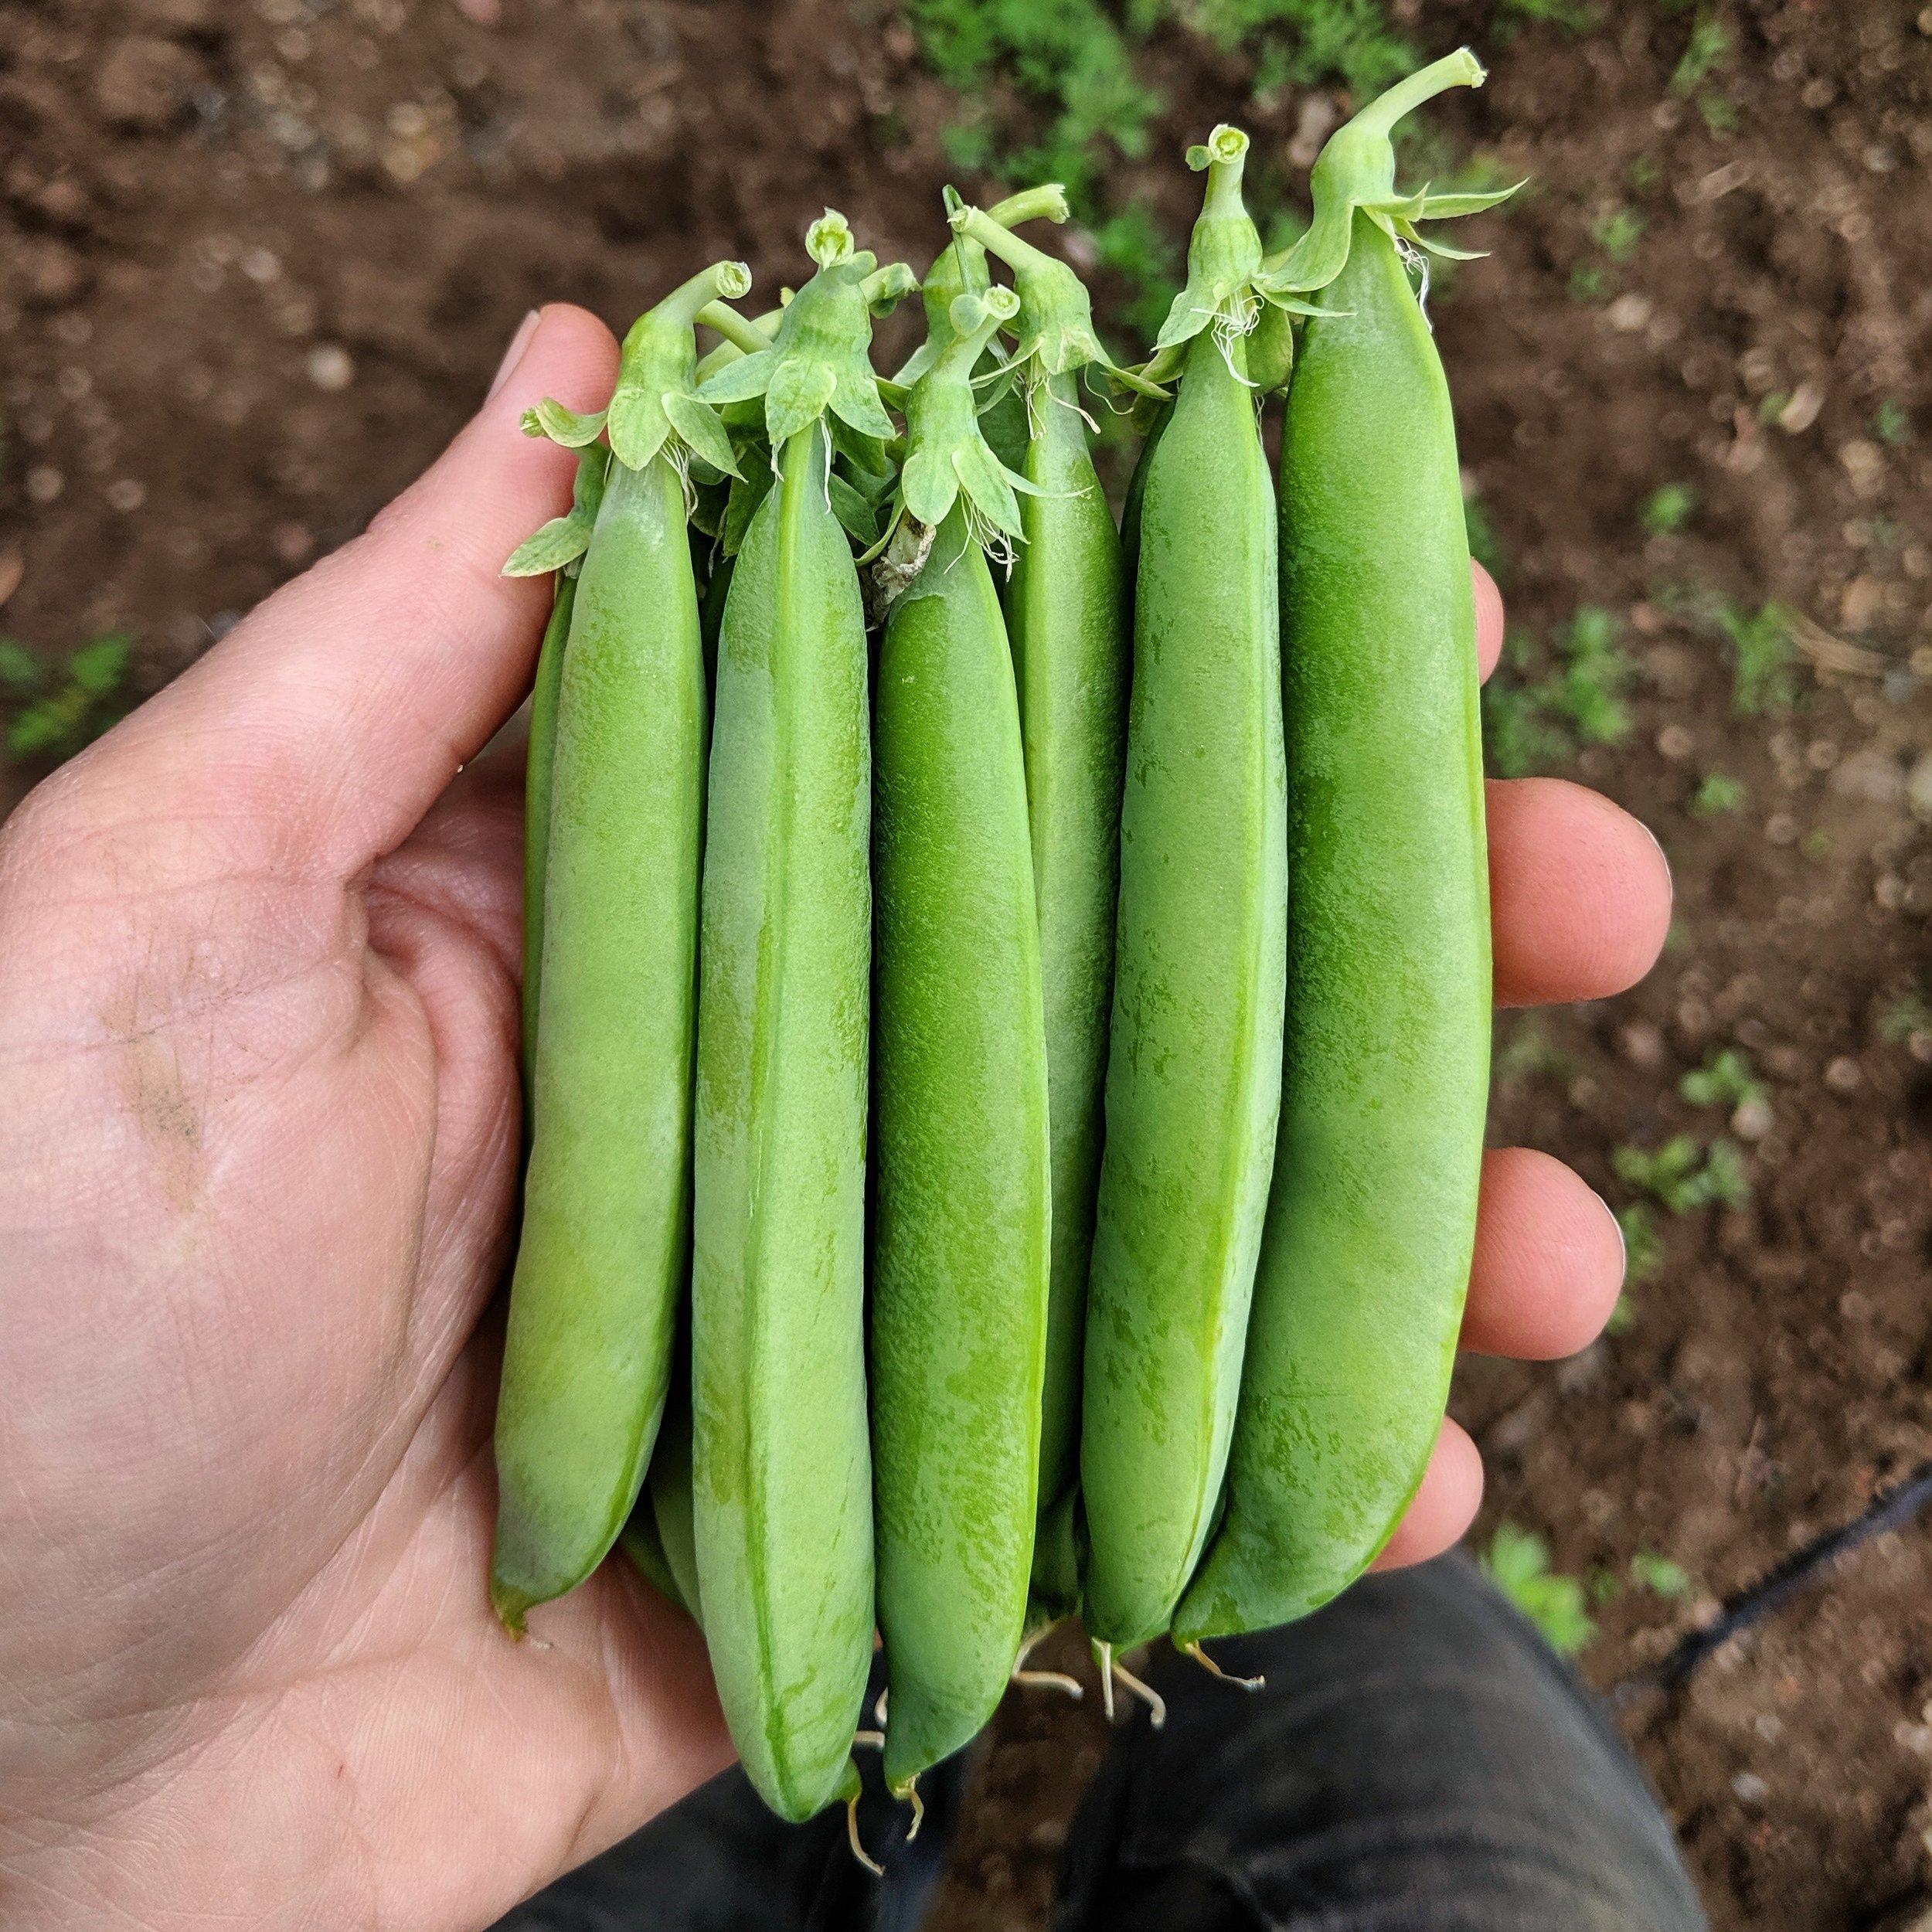 Peas : Sugar Snap, Snow Rainbow Mix (yellow, green, purple), and Shelling.